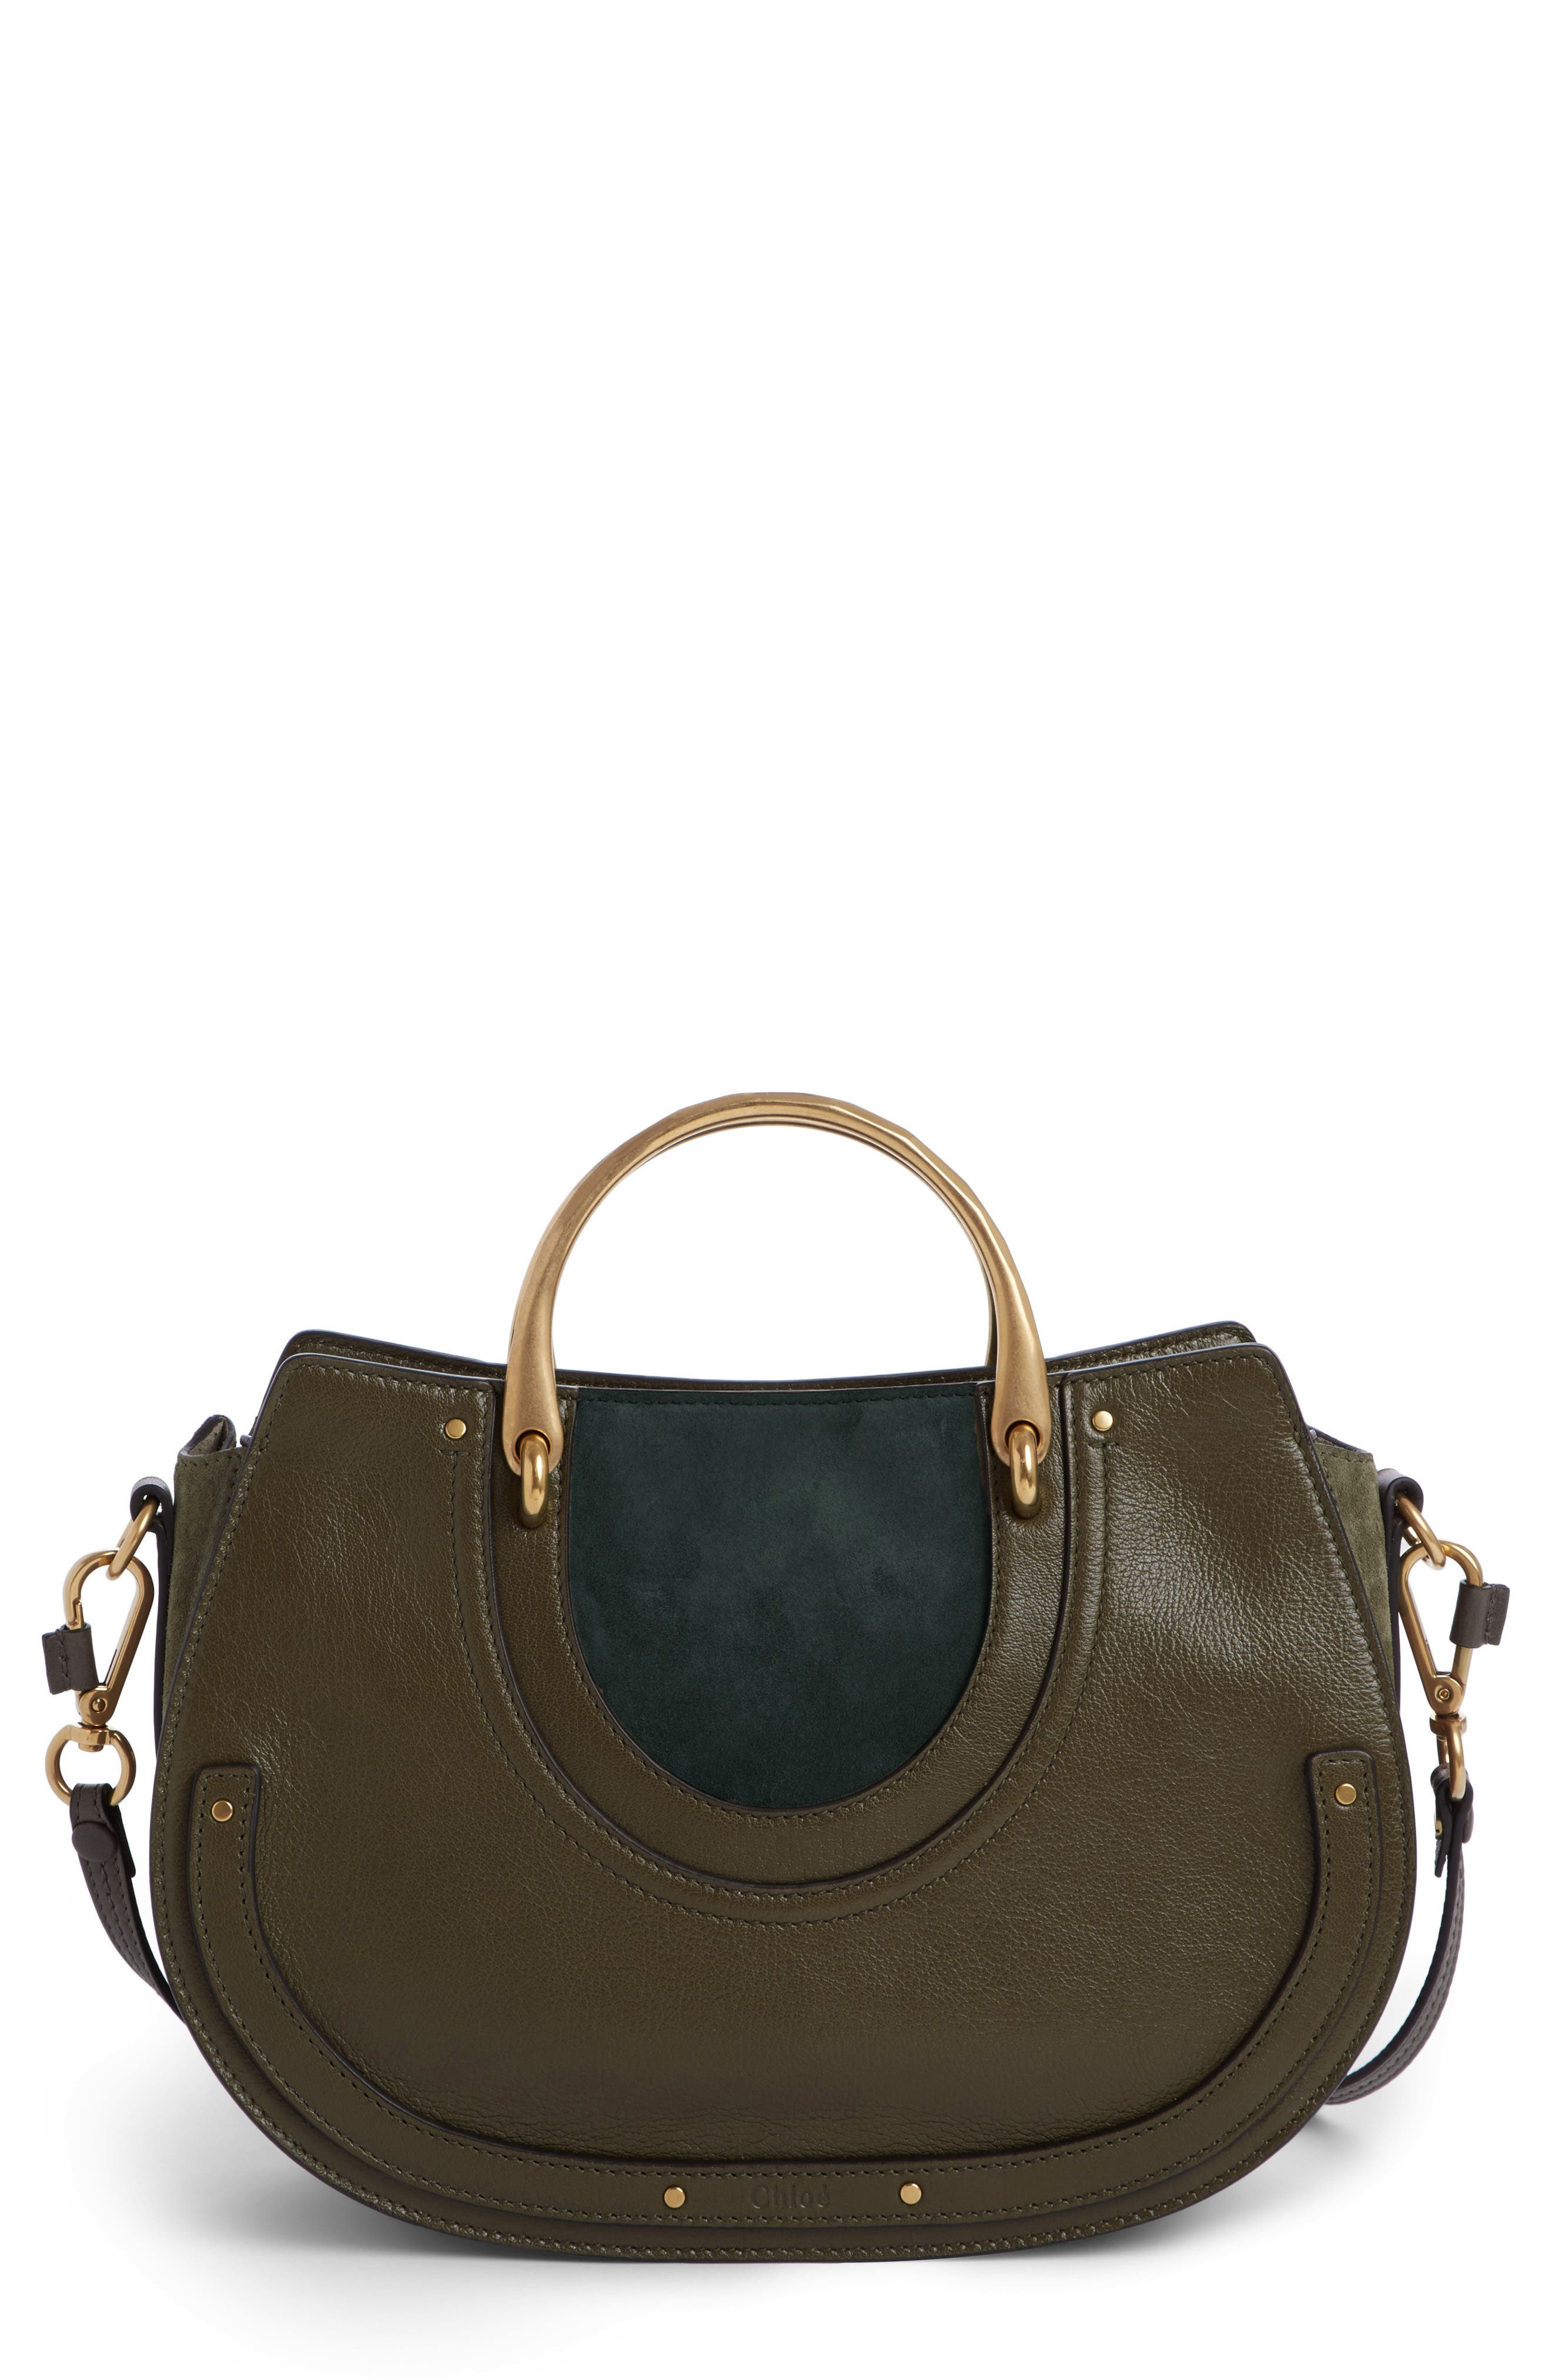 Chloé Medium Pixie Top Handle Leather Satchel